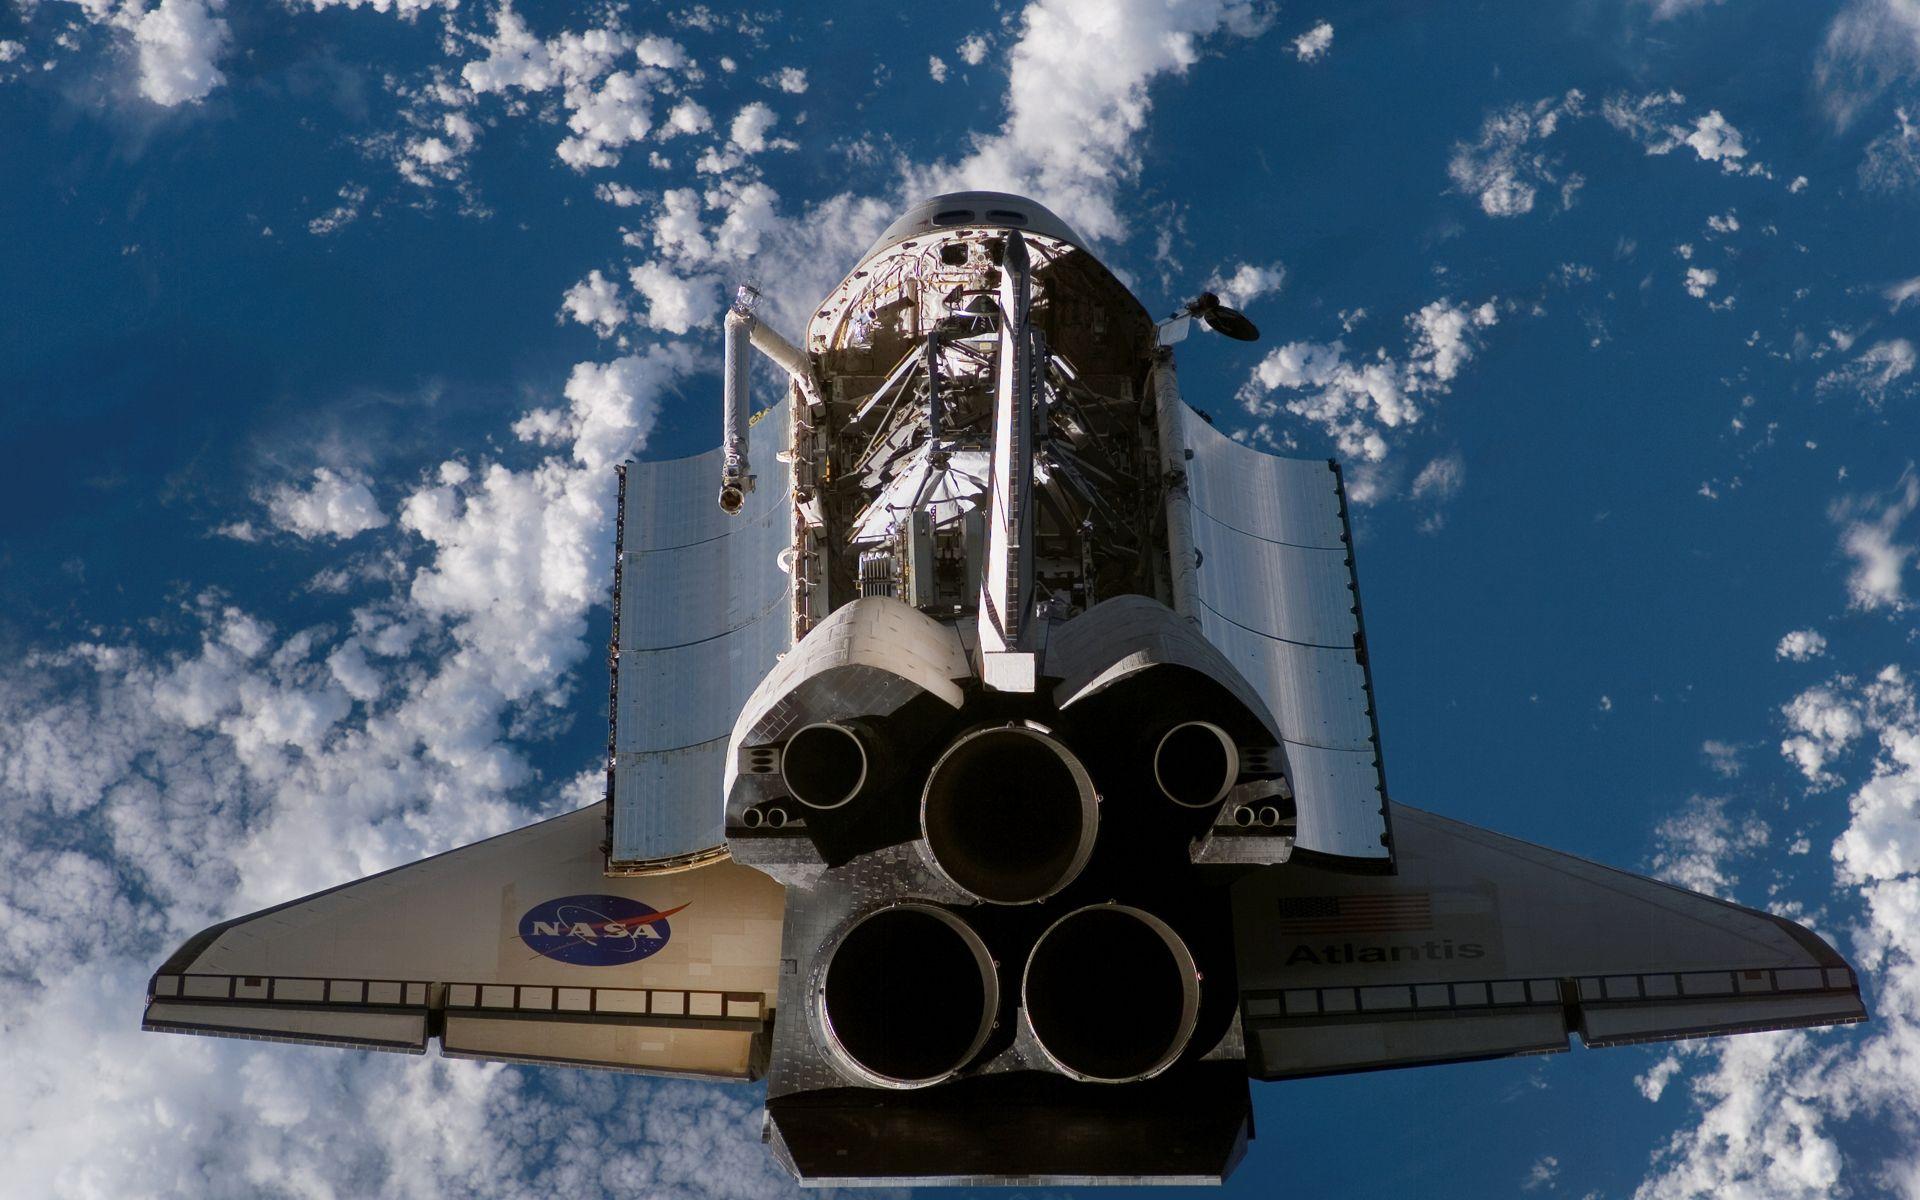 ships rockets Space Shuttle Atlantis NASA vehicles